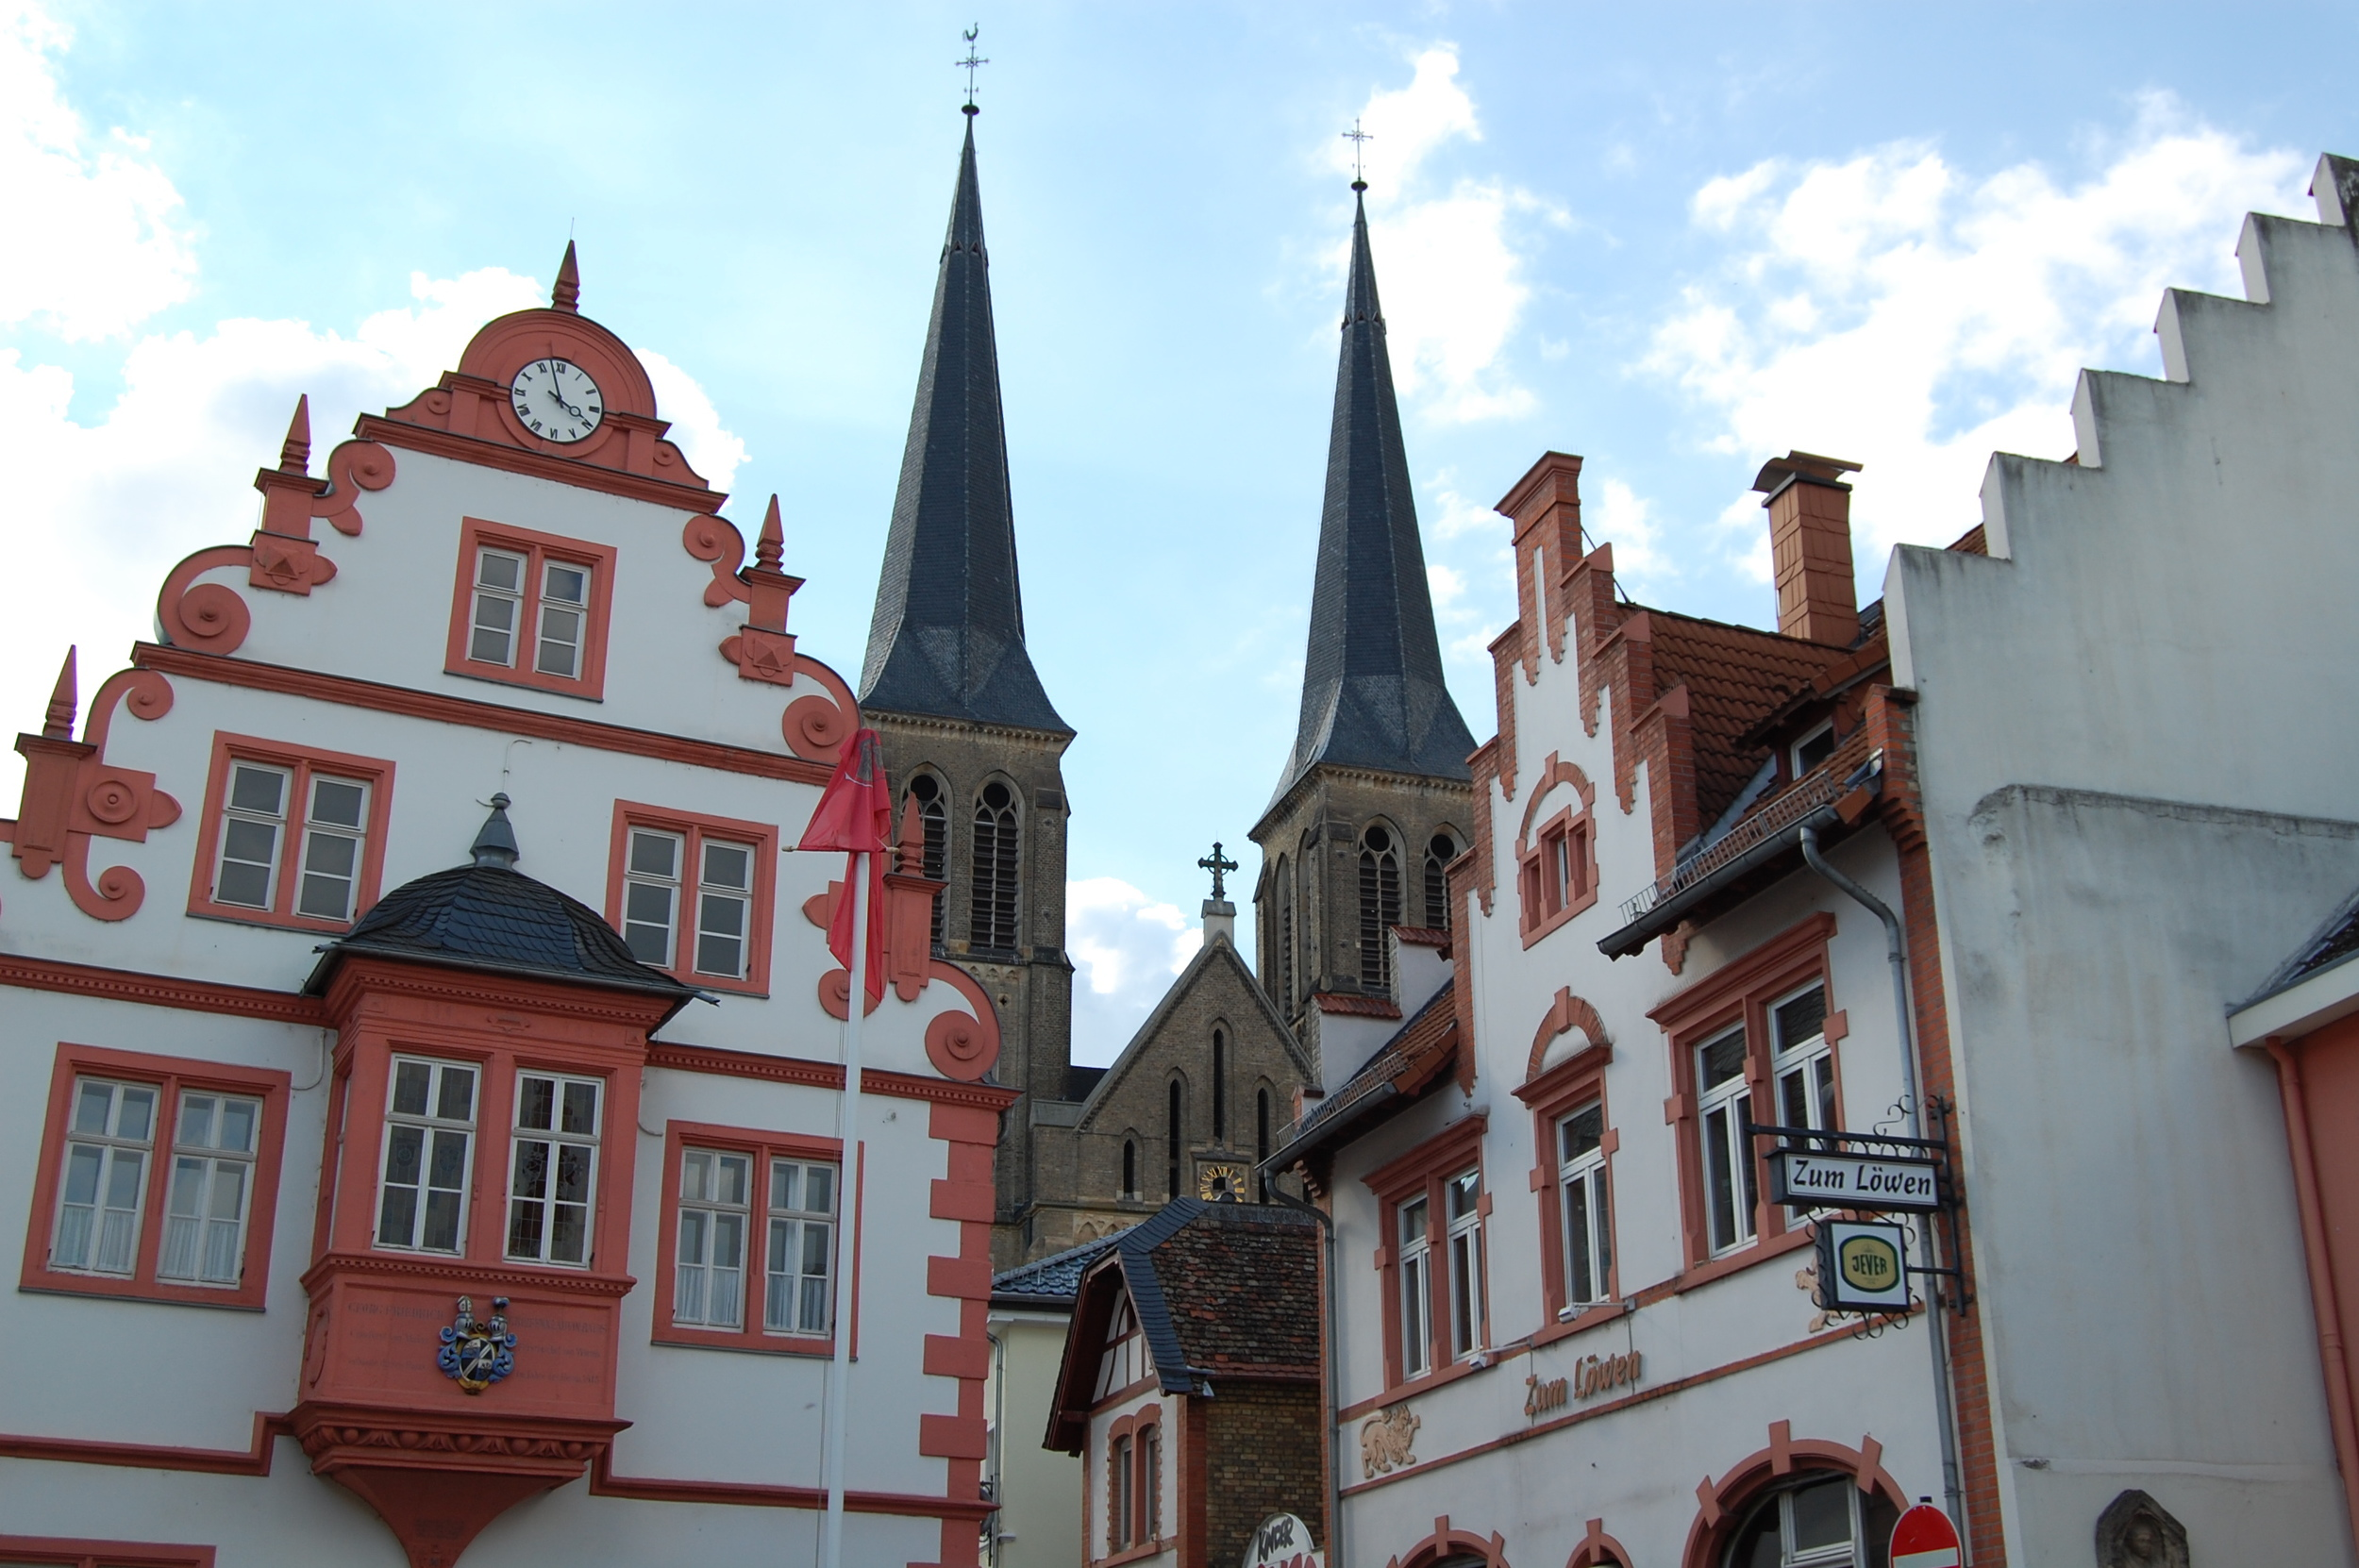 The center square in Gonsenheim.